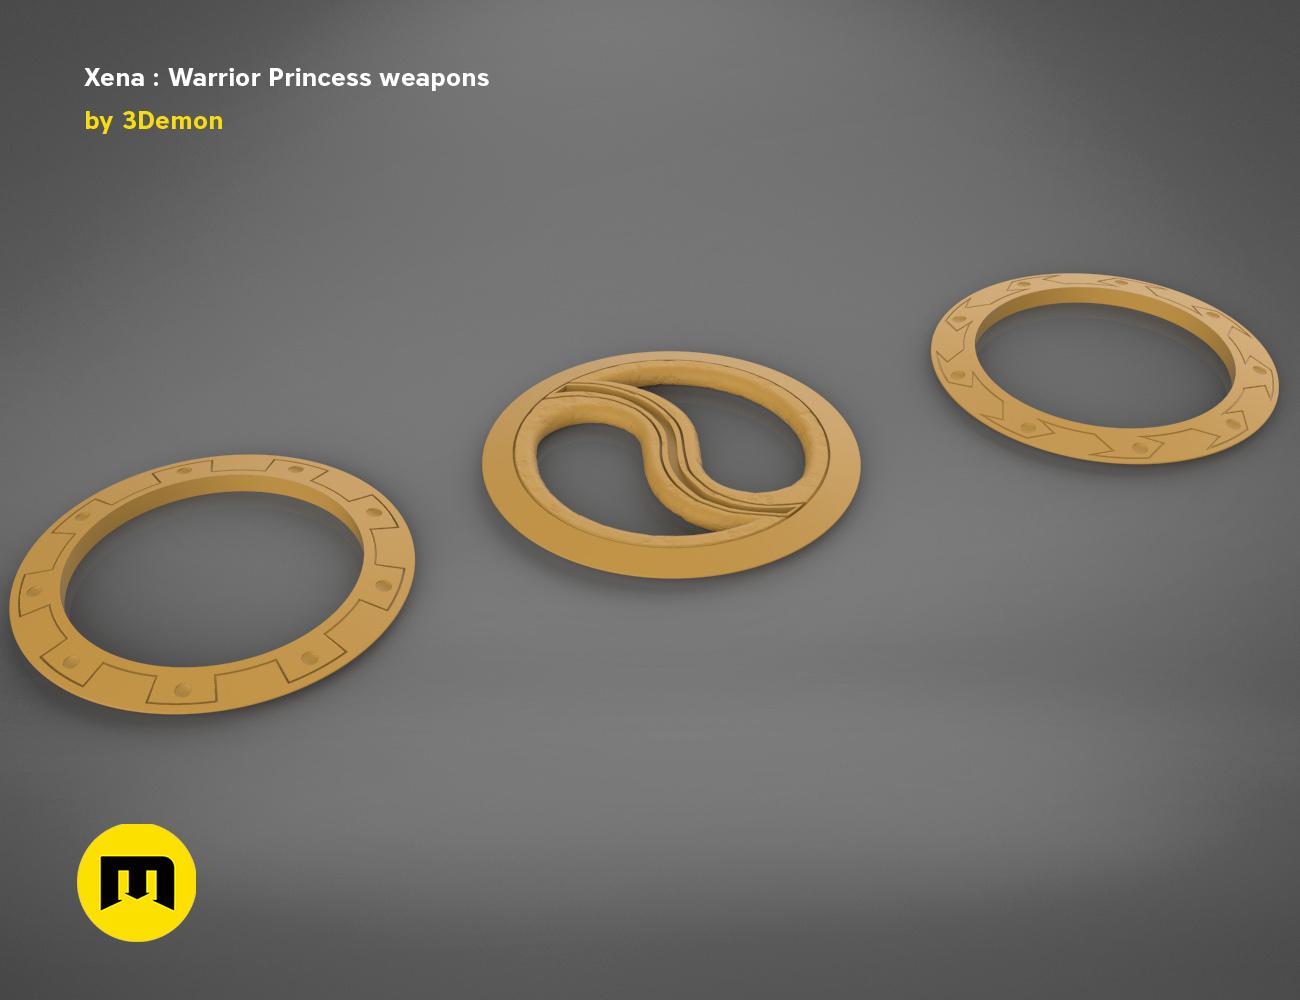 render_scene_xena-weapons-basic.54 kopie.jpg Download STL file Xena - Warrior Princess Chakrams • 3D print model, 3D-mon